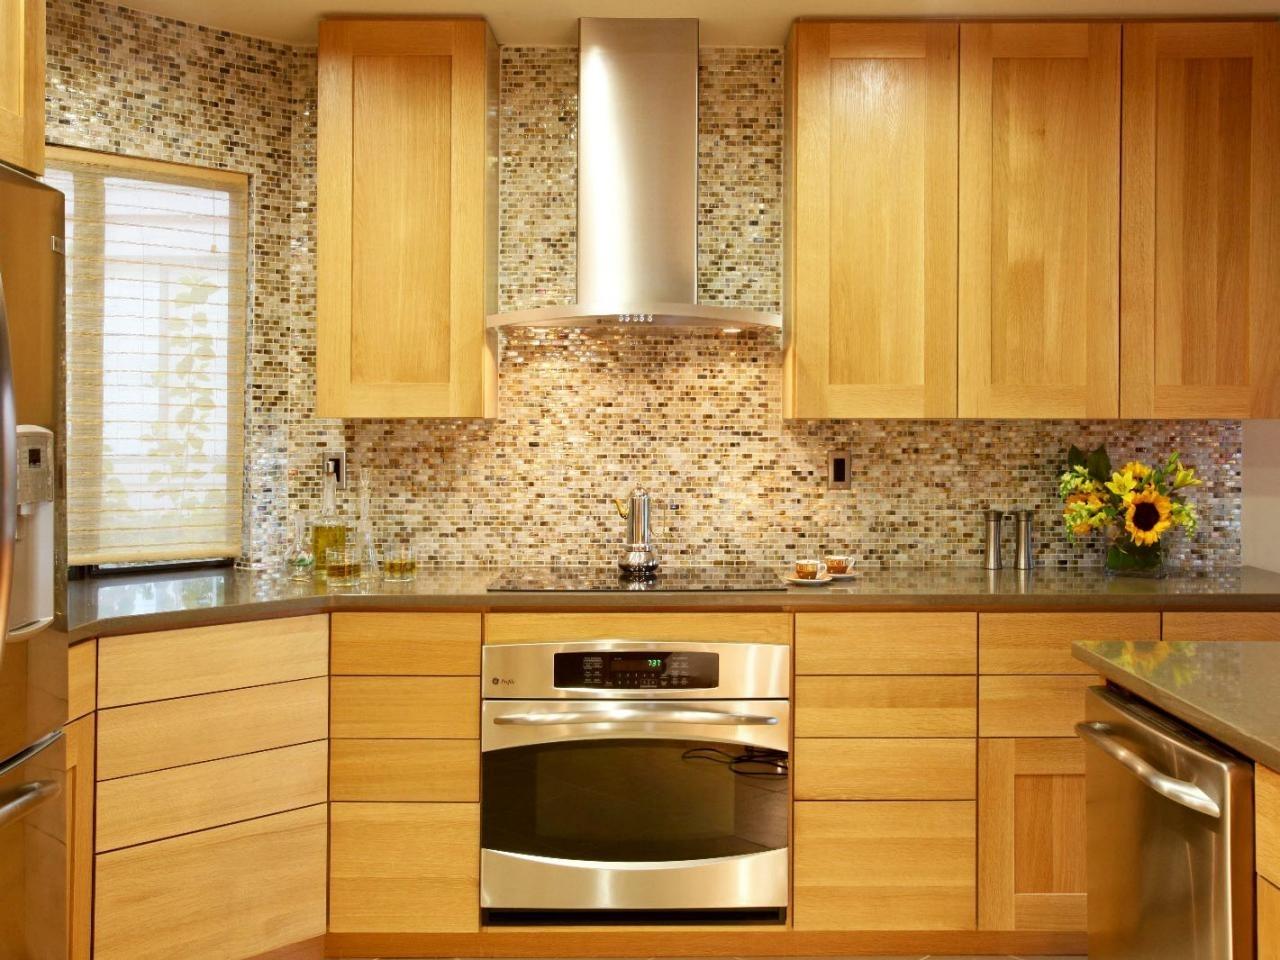 10 Pretty Ideas For Backsplash In Kitchen %name 2021